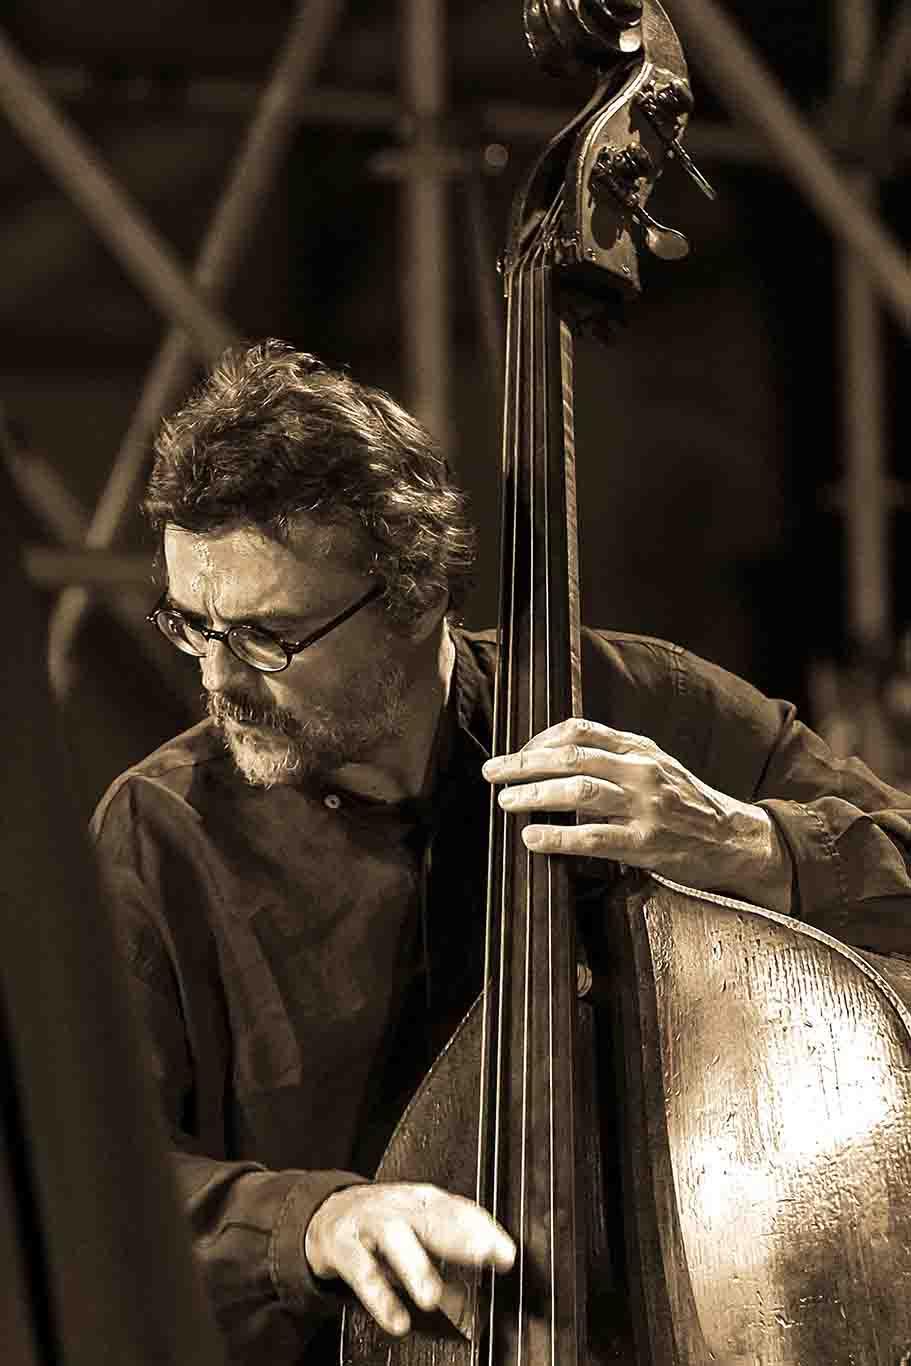 Roberto Bonati